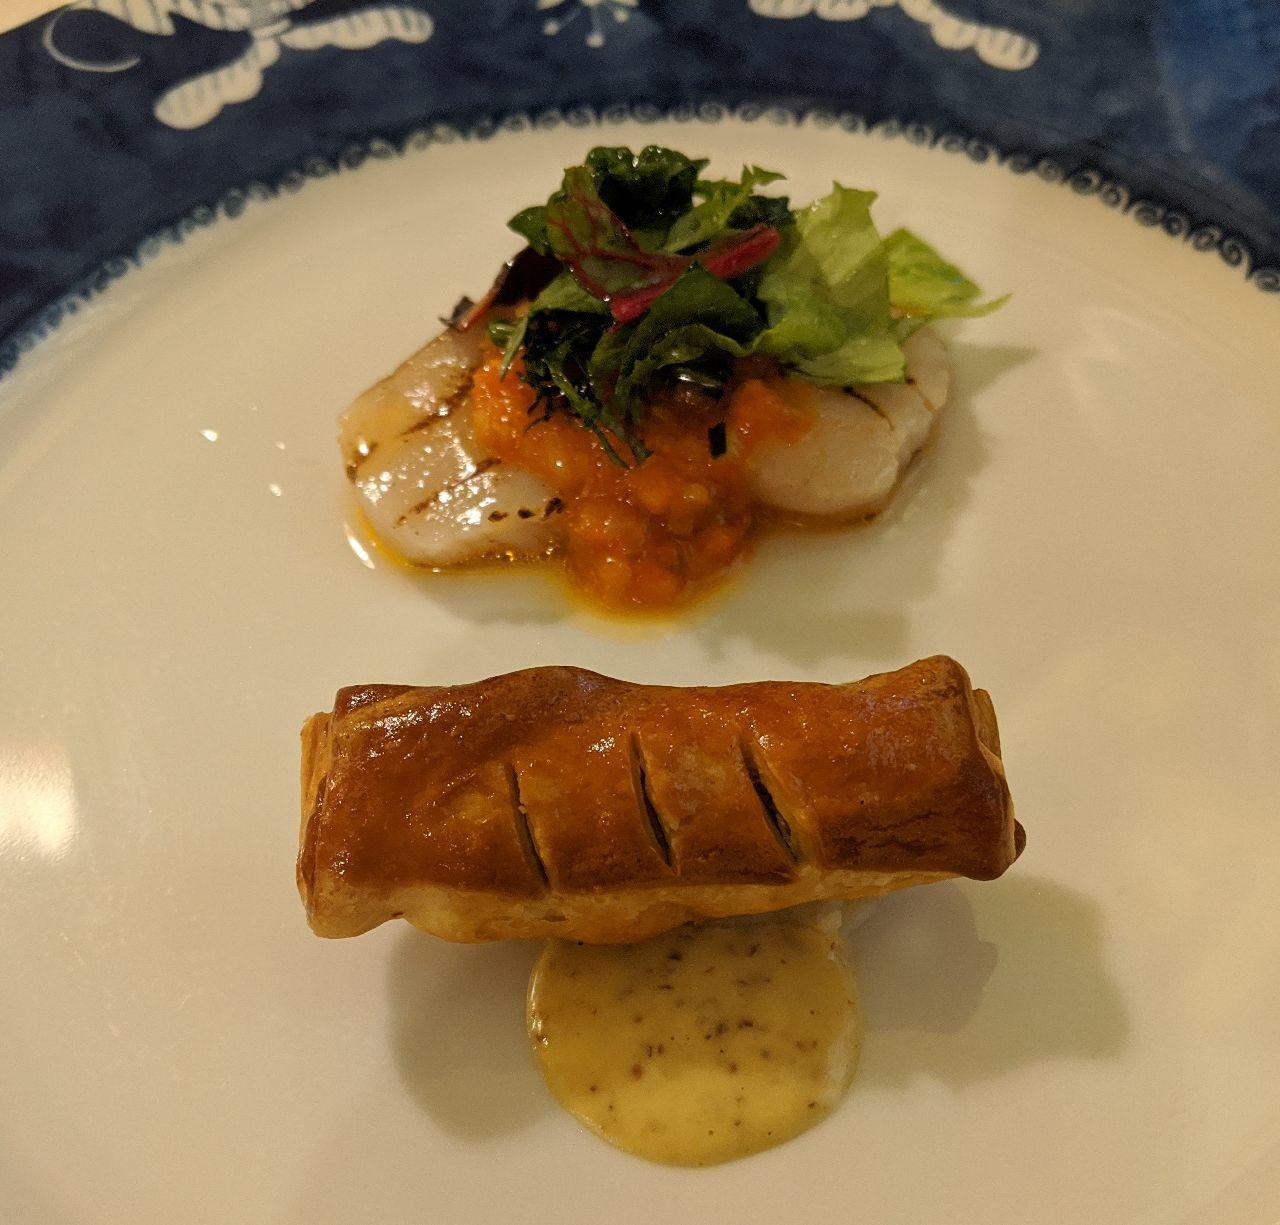 MVIMG_20200530_184229帆立貝の網焼き、ラタトゥイユ風ソース、ツブ貝の小さなパイ包み焼き、粒マスタード風味